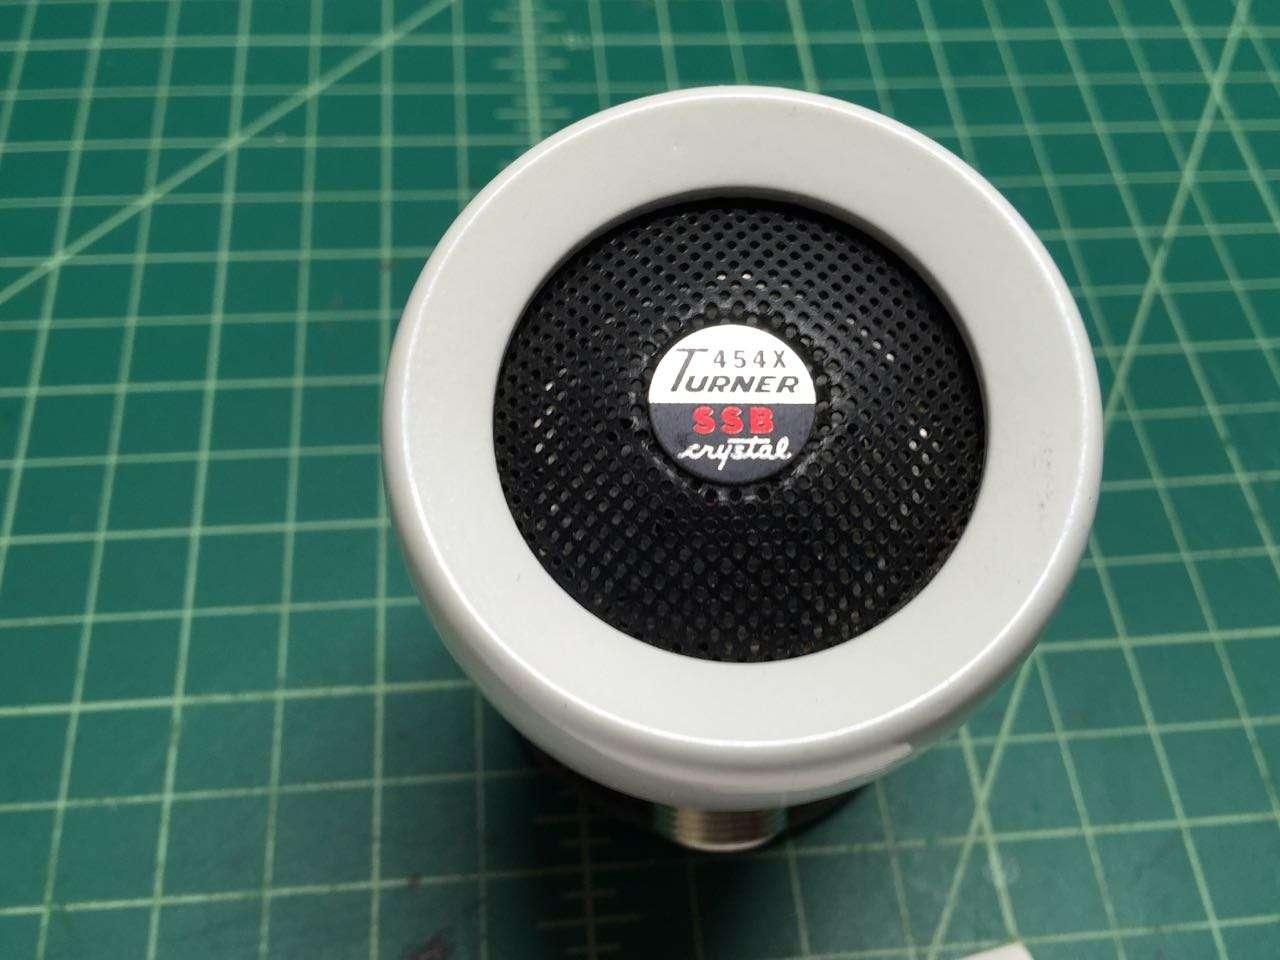 Turner 454 Microphone Wiring Trusted Diagrams Cbtricks Mic Simple Mics Custom Bullet 1950 Shure Black Cr